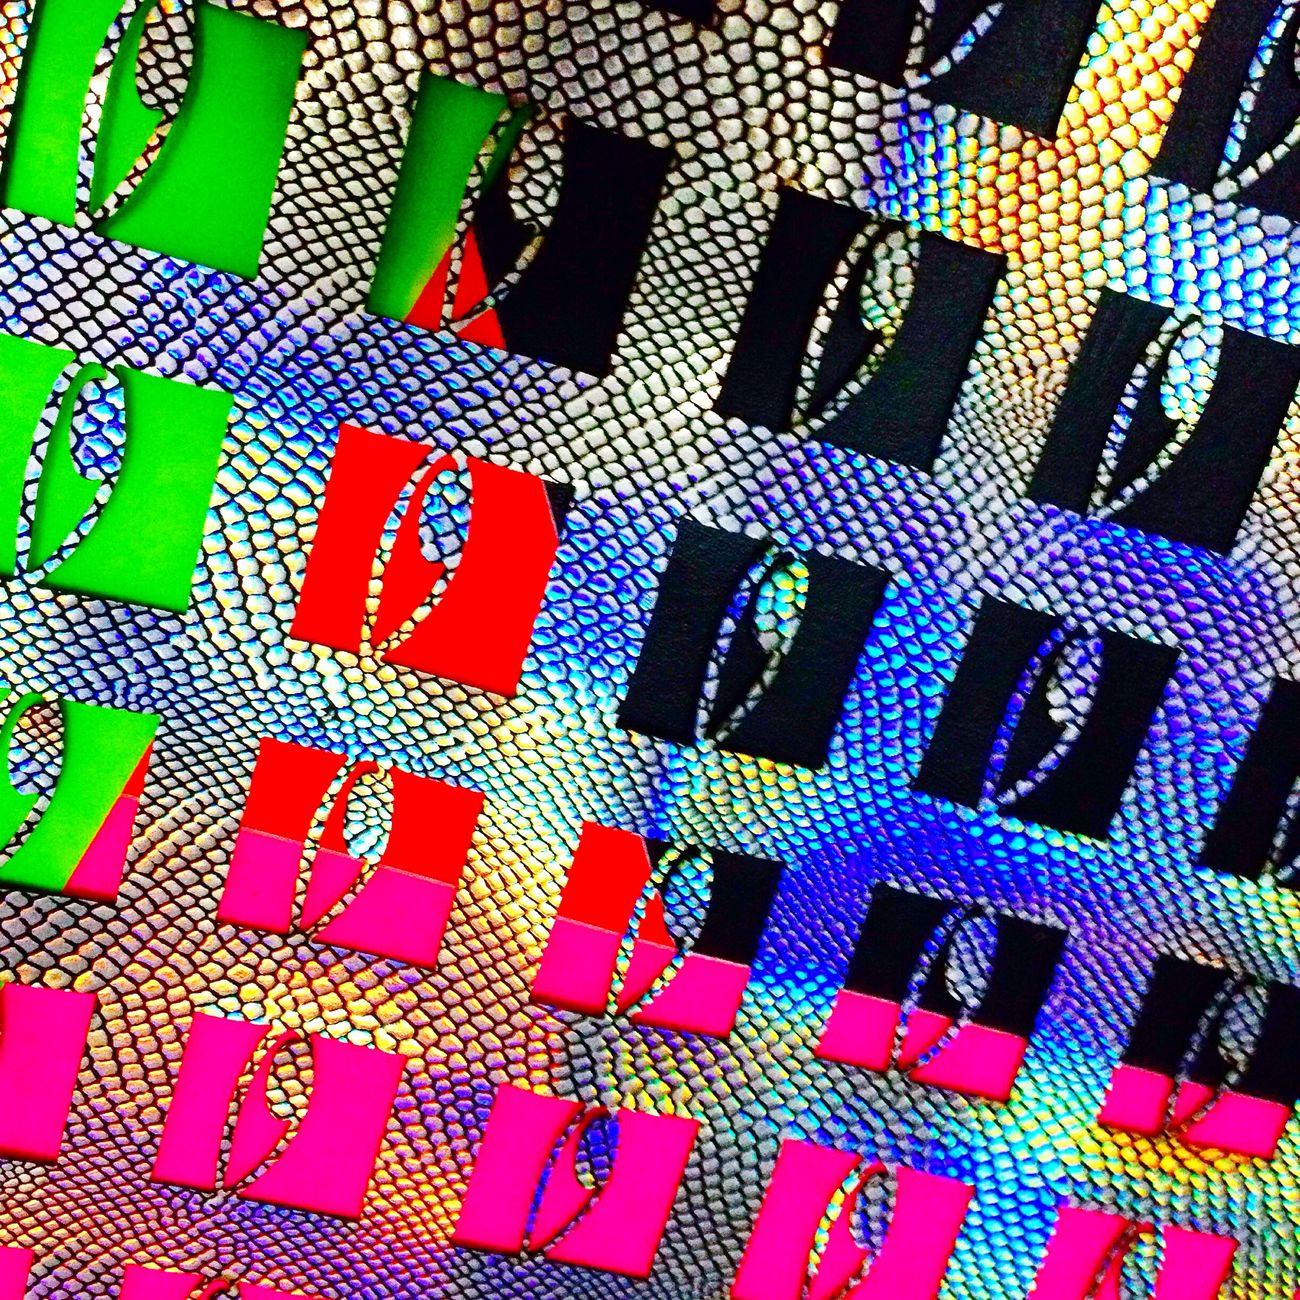 Laviniafenton New Bagdesigner Fashion Laserart Neon Bags Design Process Free